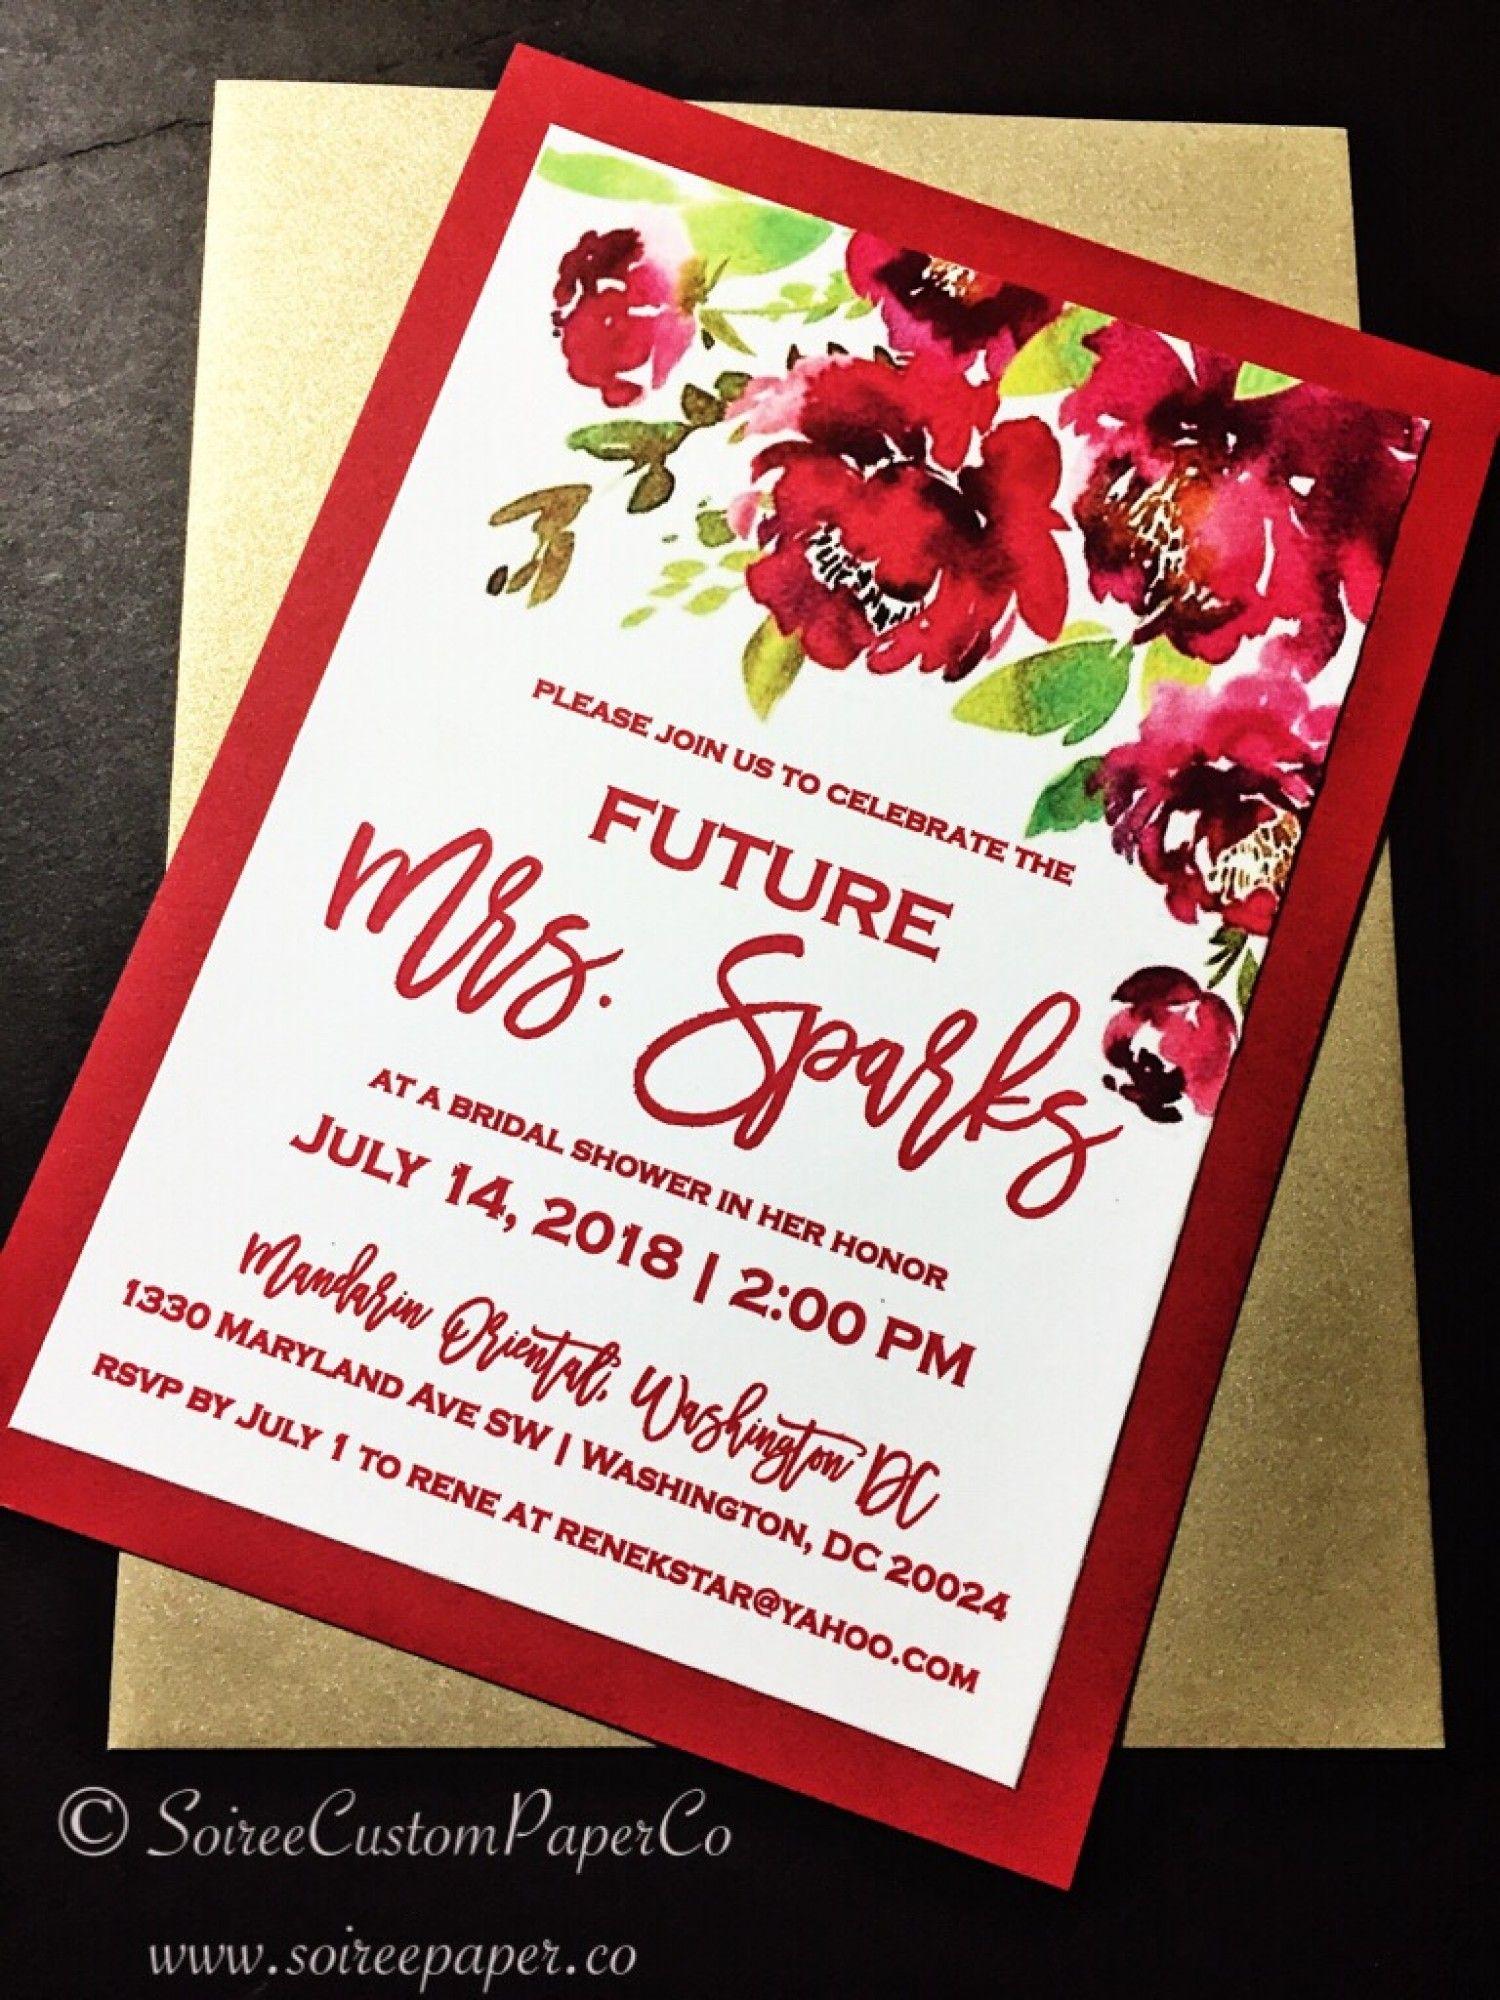 Bridal Shower Invitation - Watercolor Floral Bridal Shower ...